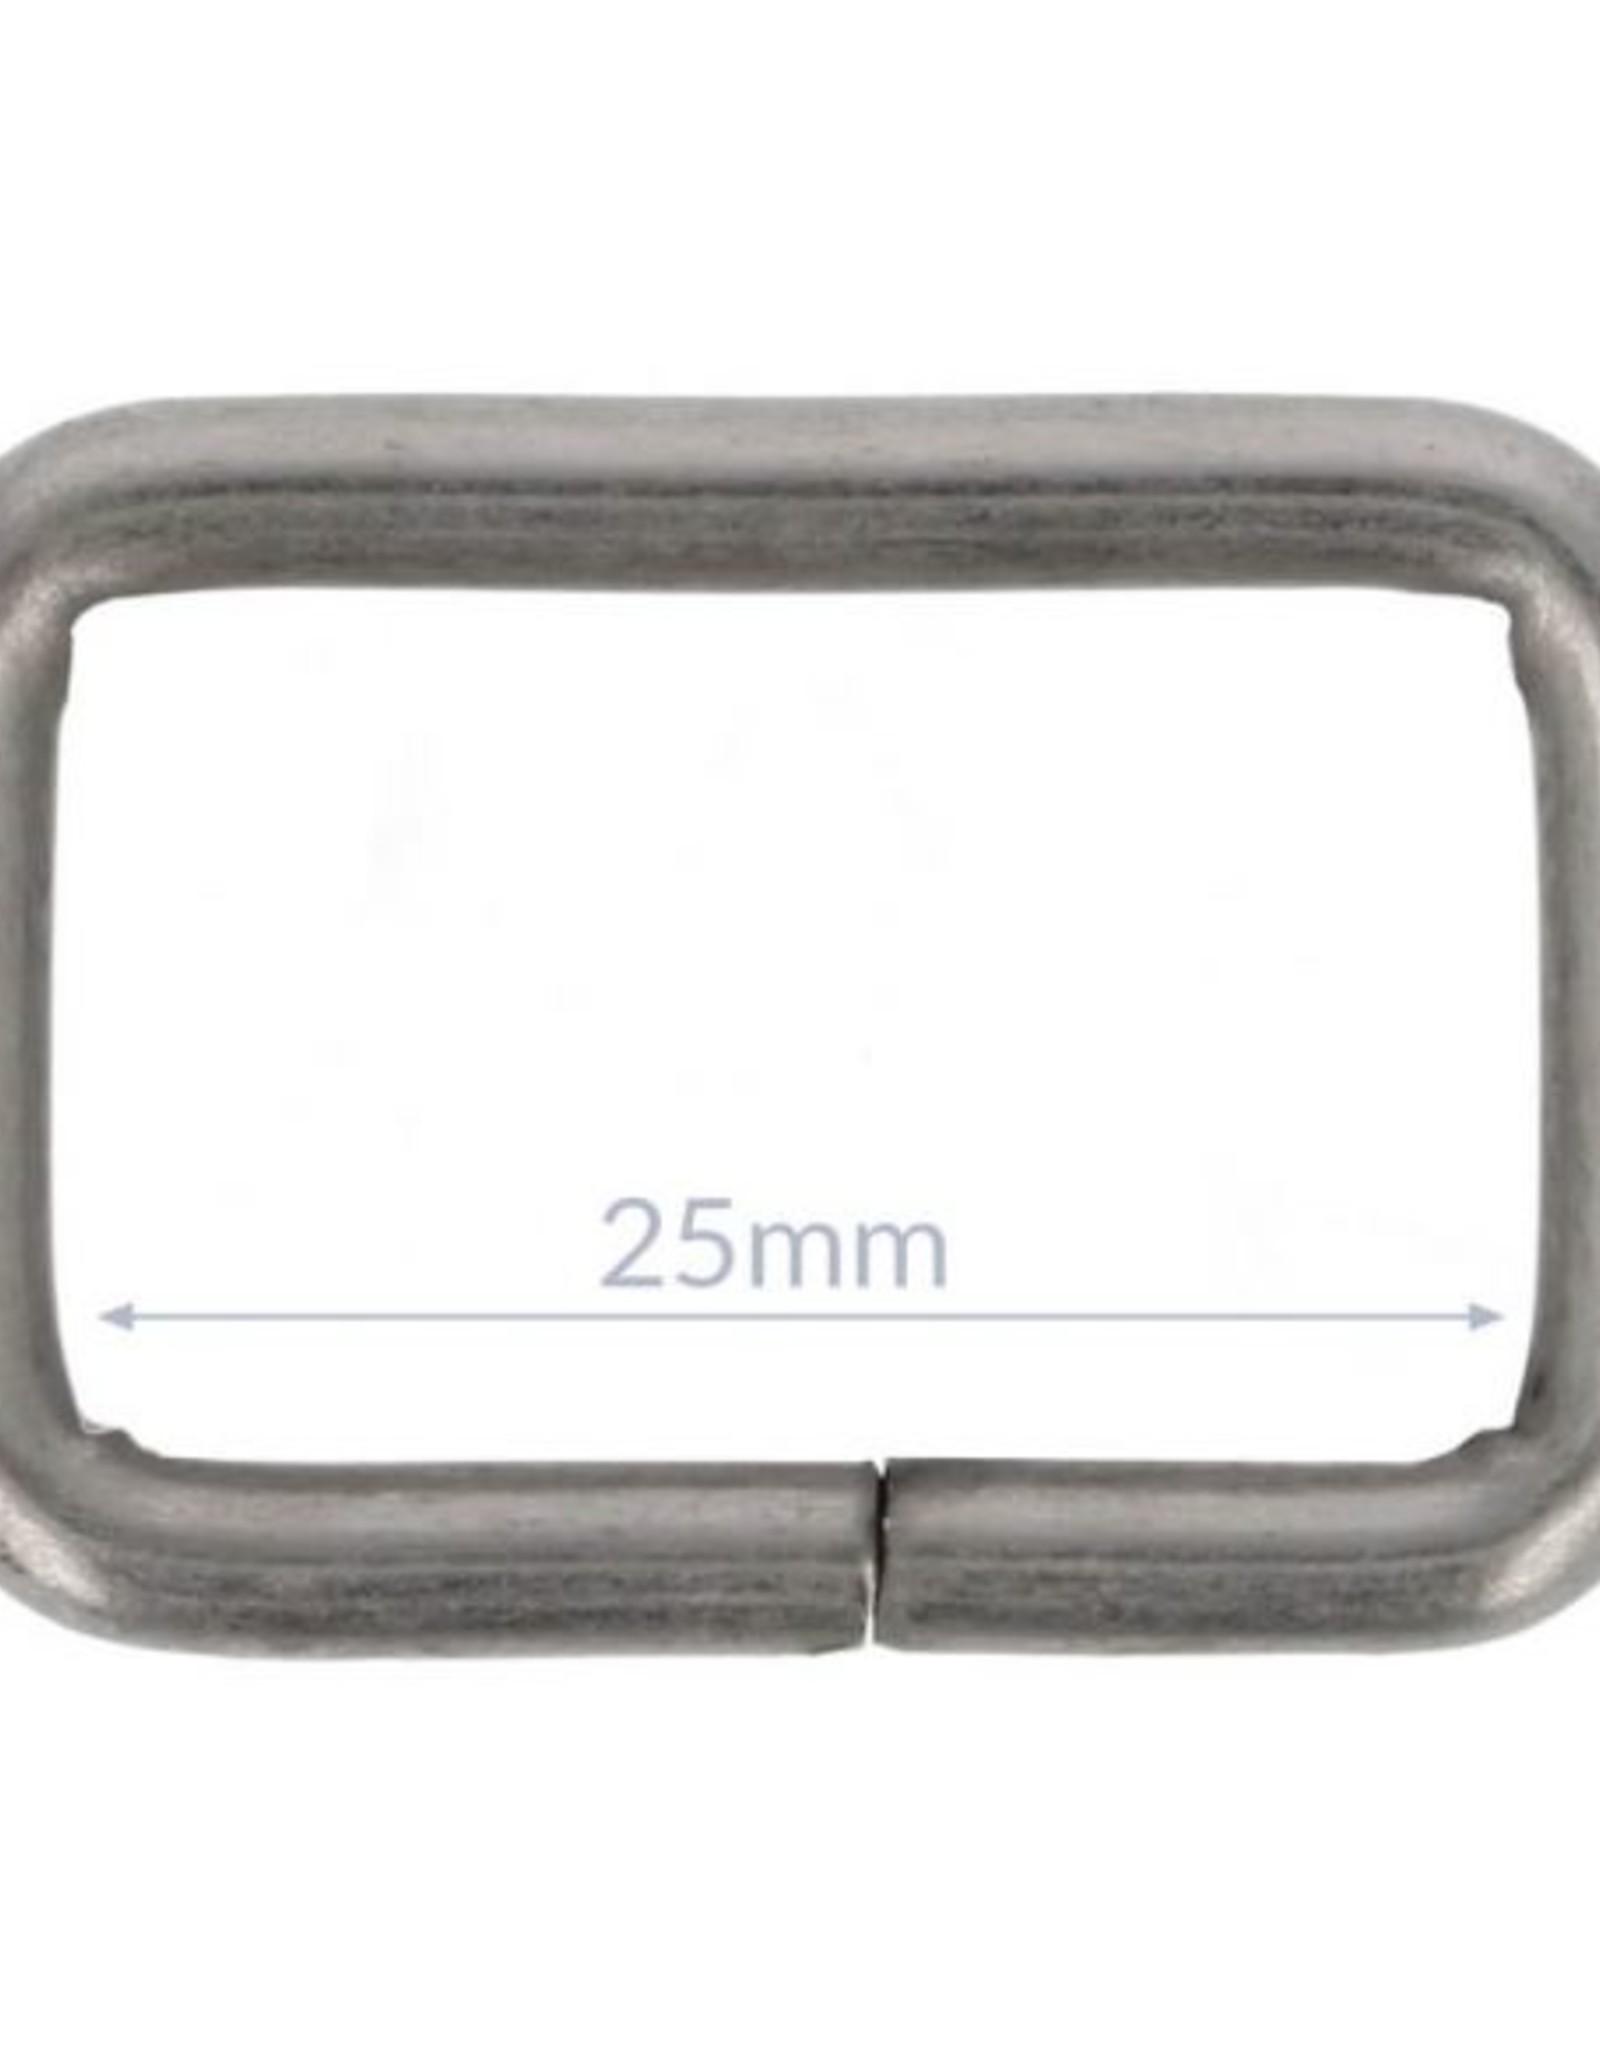 Passant 25mm